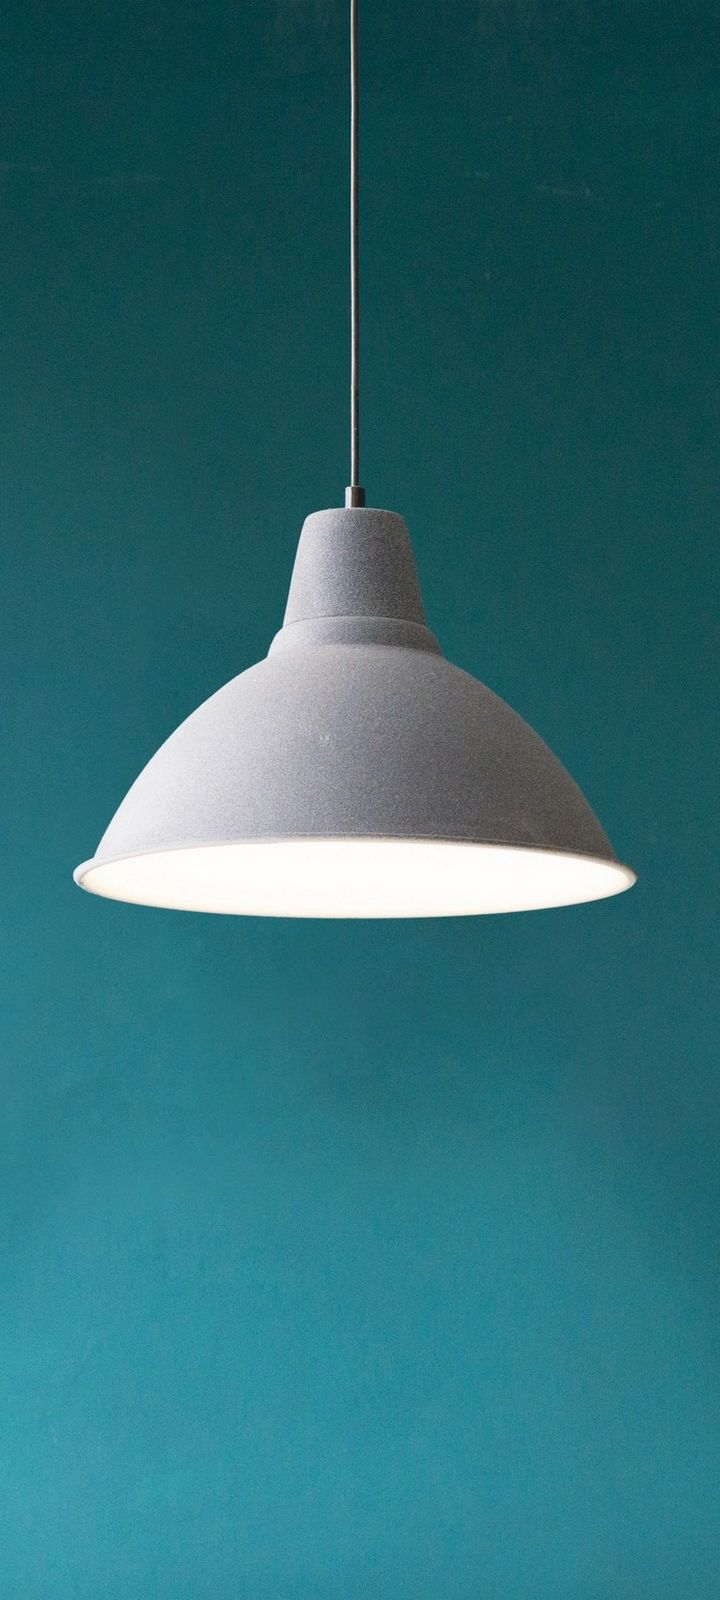 Lamp Electricity Minimalism Wallpaper 720x1600